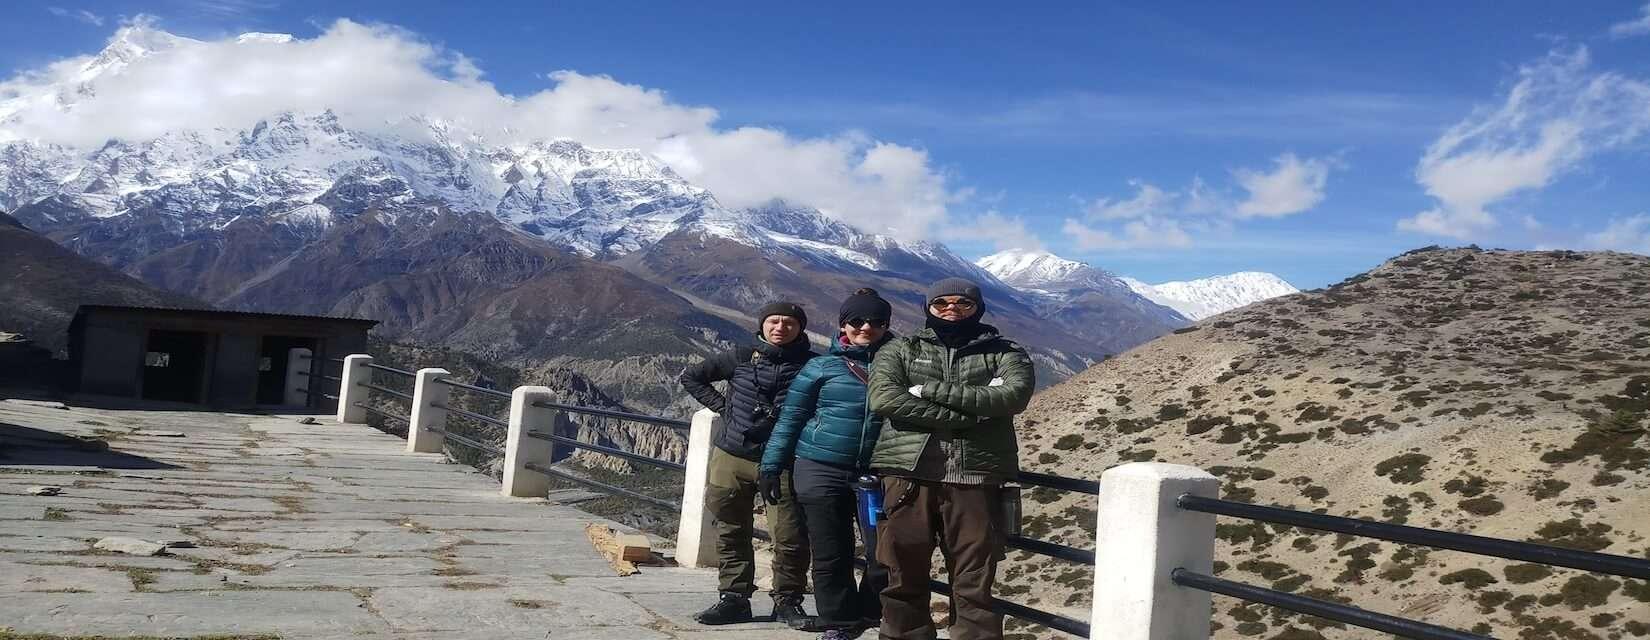 15 day Tilicho Lake and Annapurna Circuit trekking adventure in Nepal